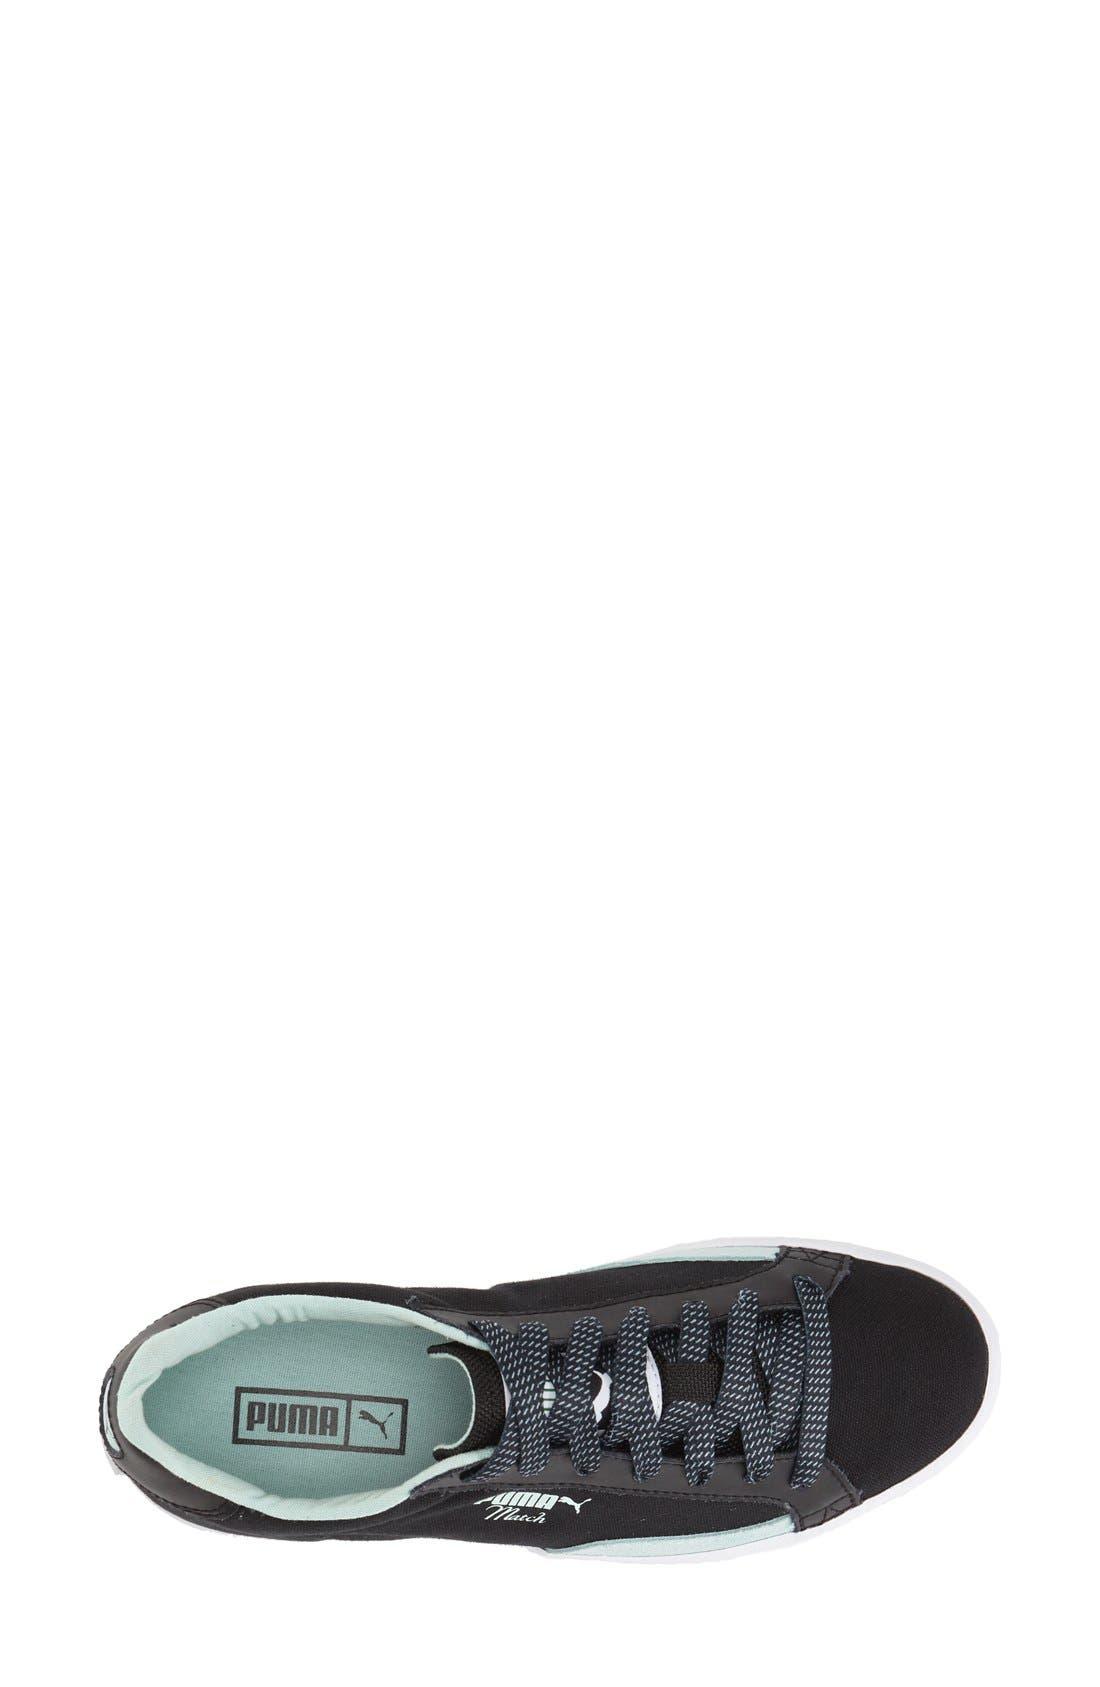 Alternate Image 3  - PUMA 'Match Vulc' Sneaker (Women)